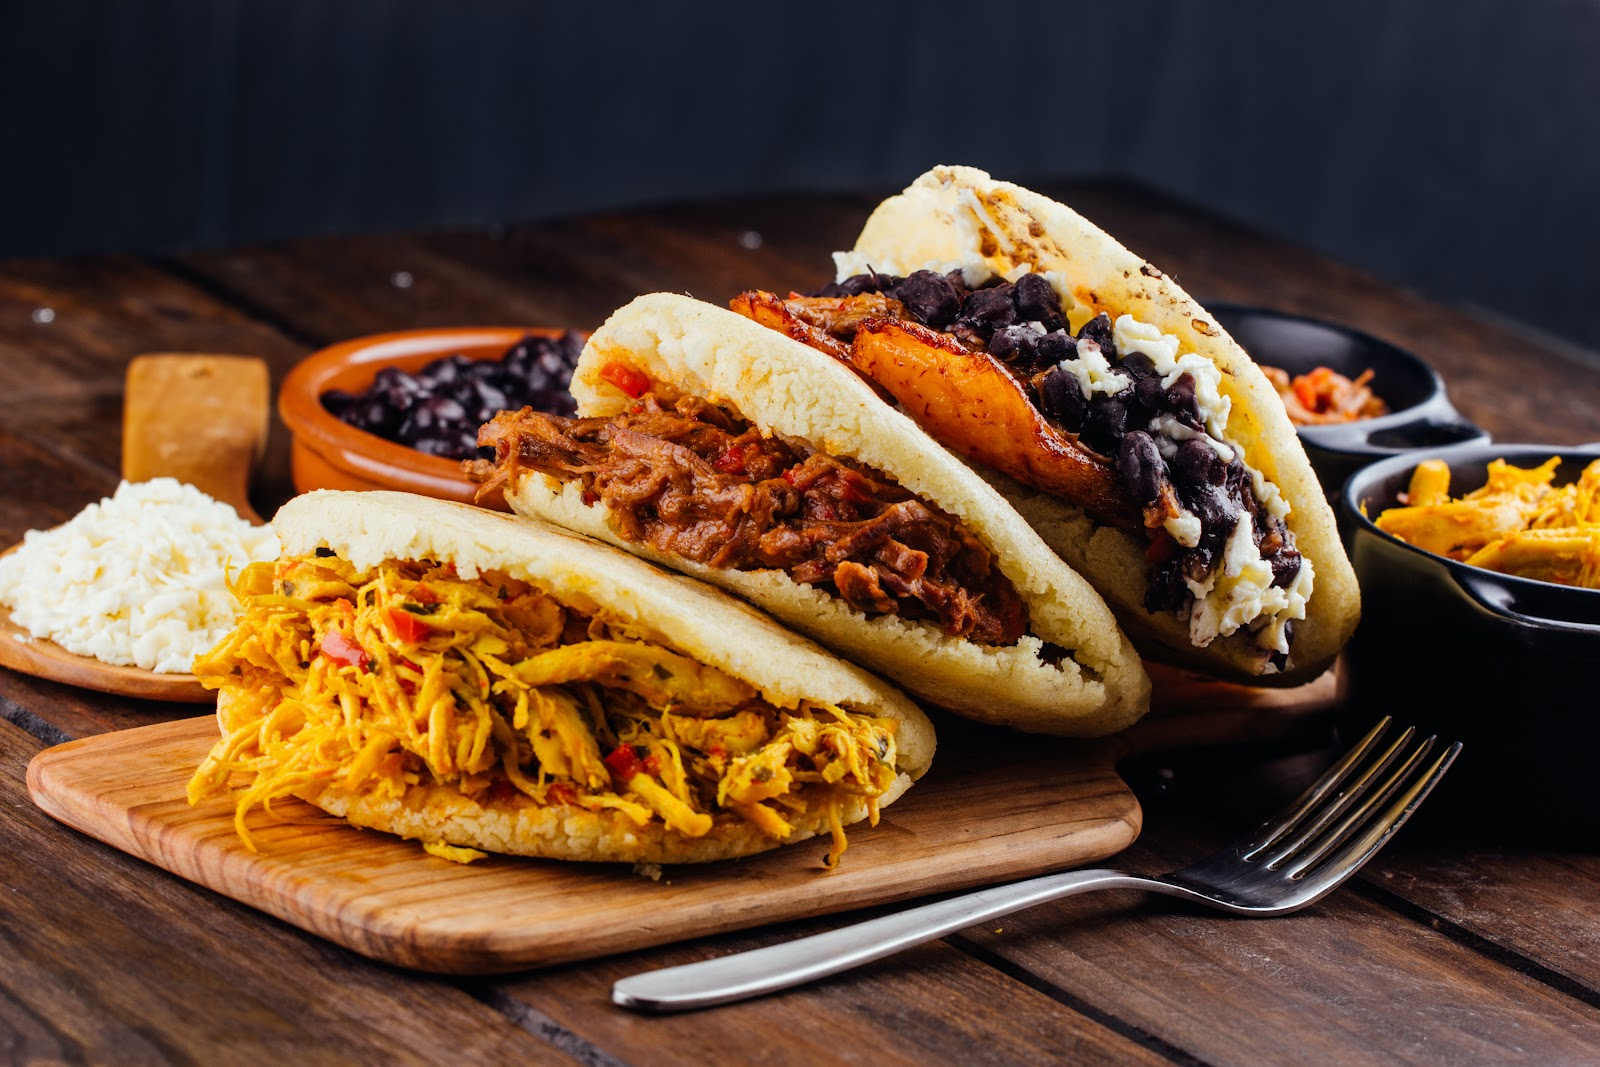 Viva Las Arepas in Las Vegas serving three arepas on a wood board with beef, beans, rice, pork, and more.